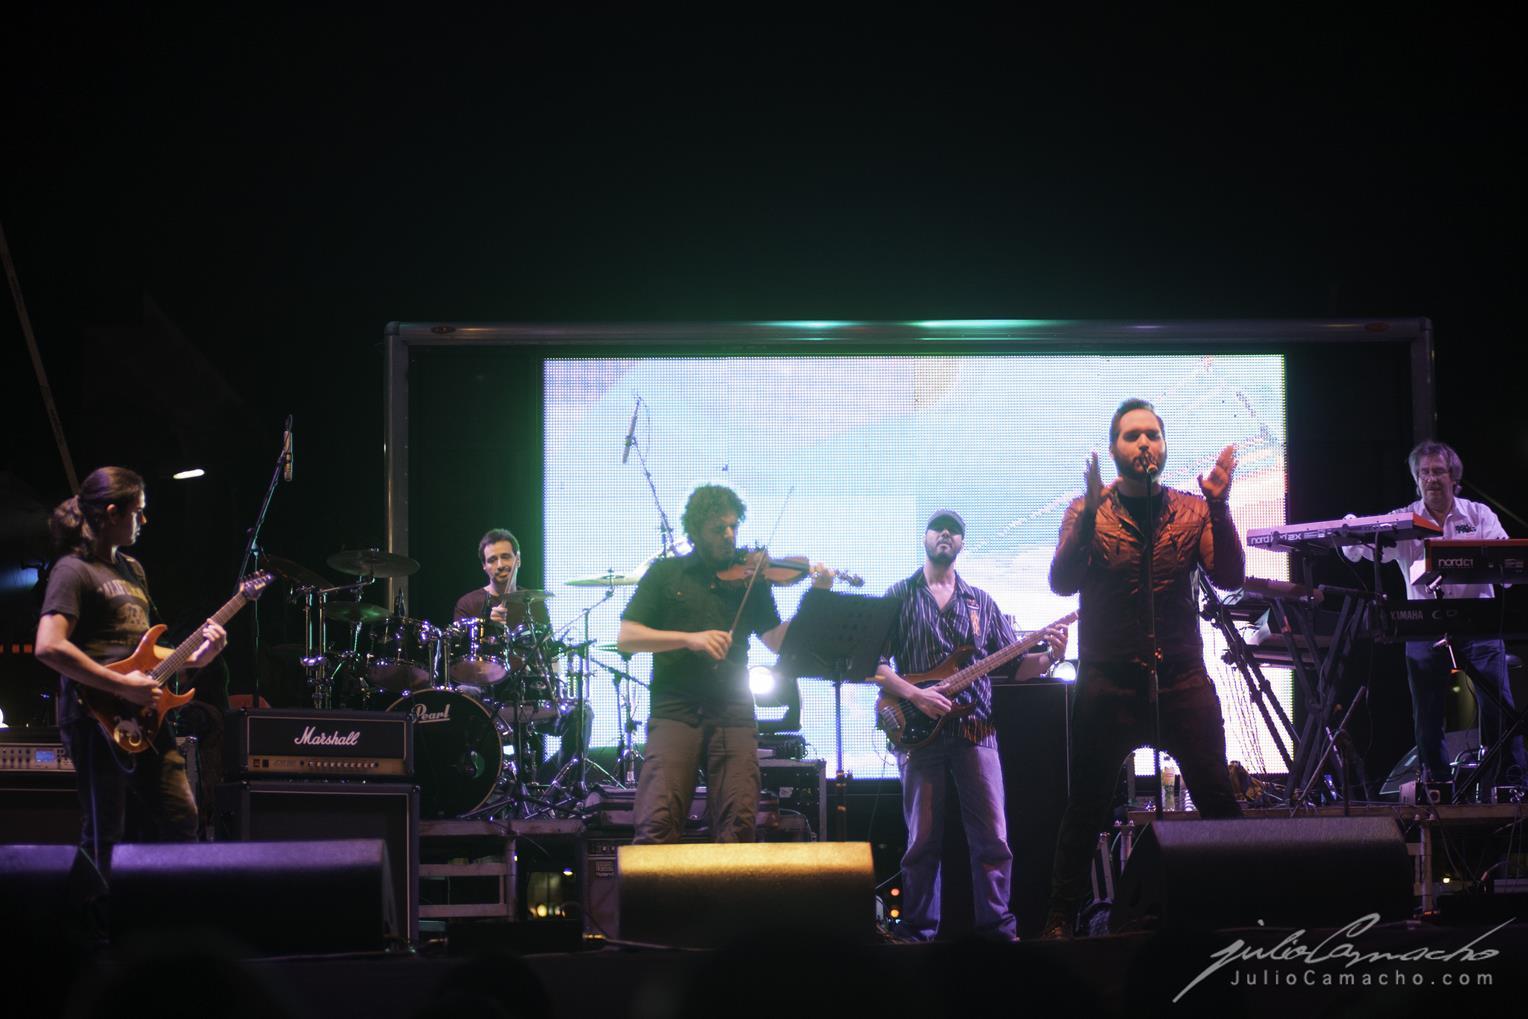 2014-10-30 31 CAST TOUR Ensenada y Tijuana - 1401 - www.Juli (Copy).jpg